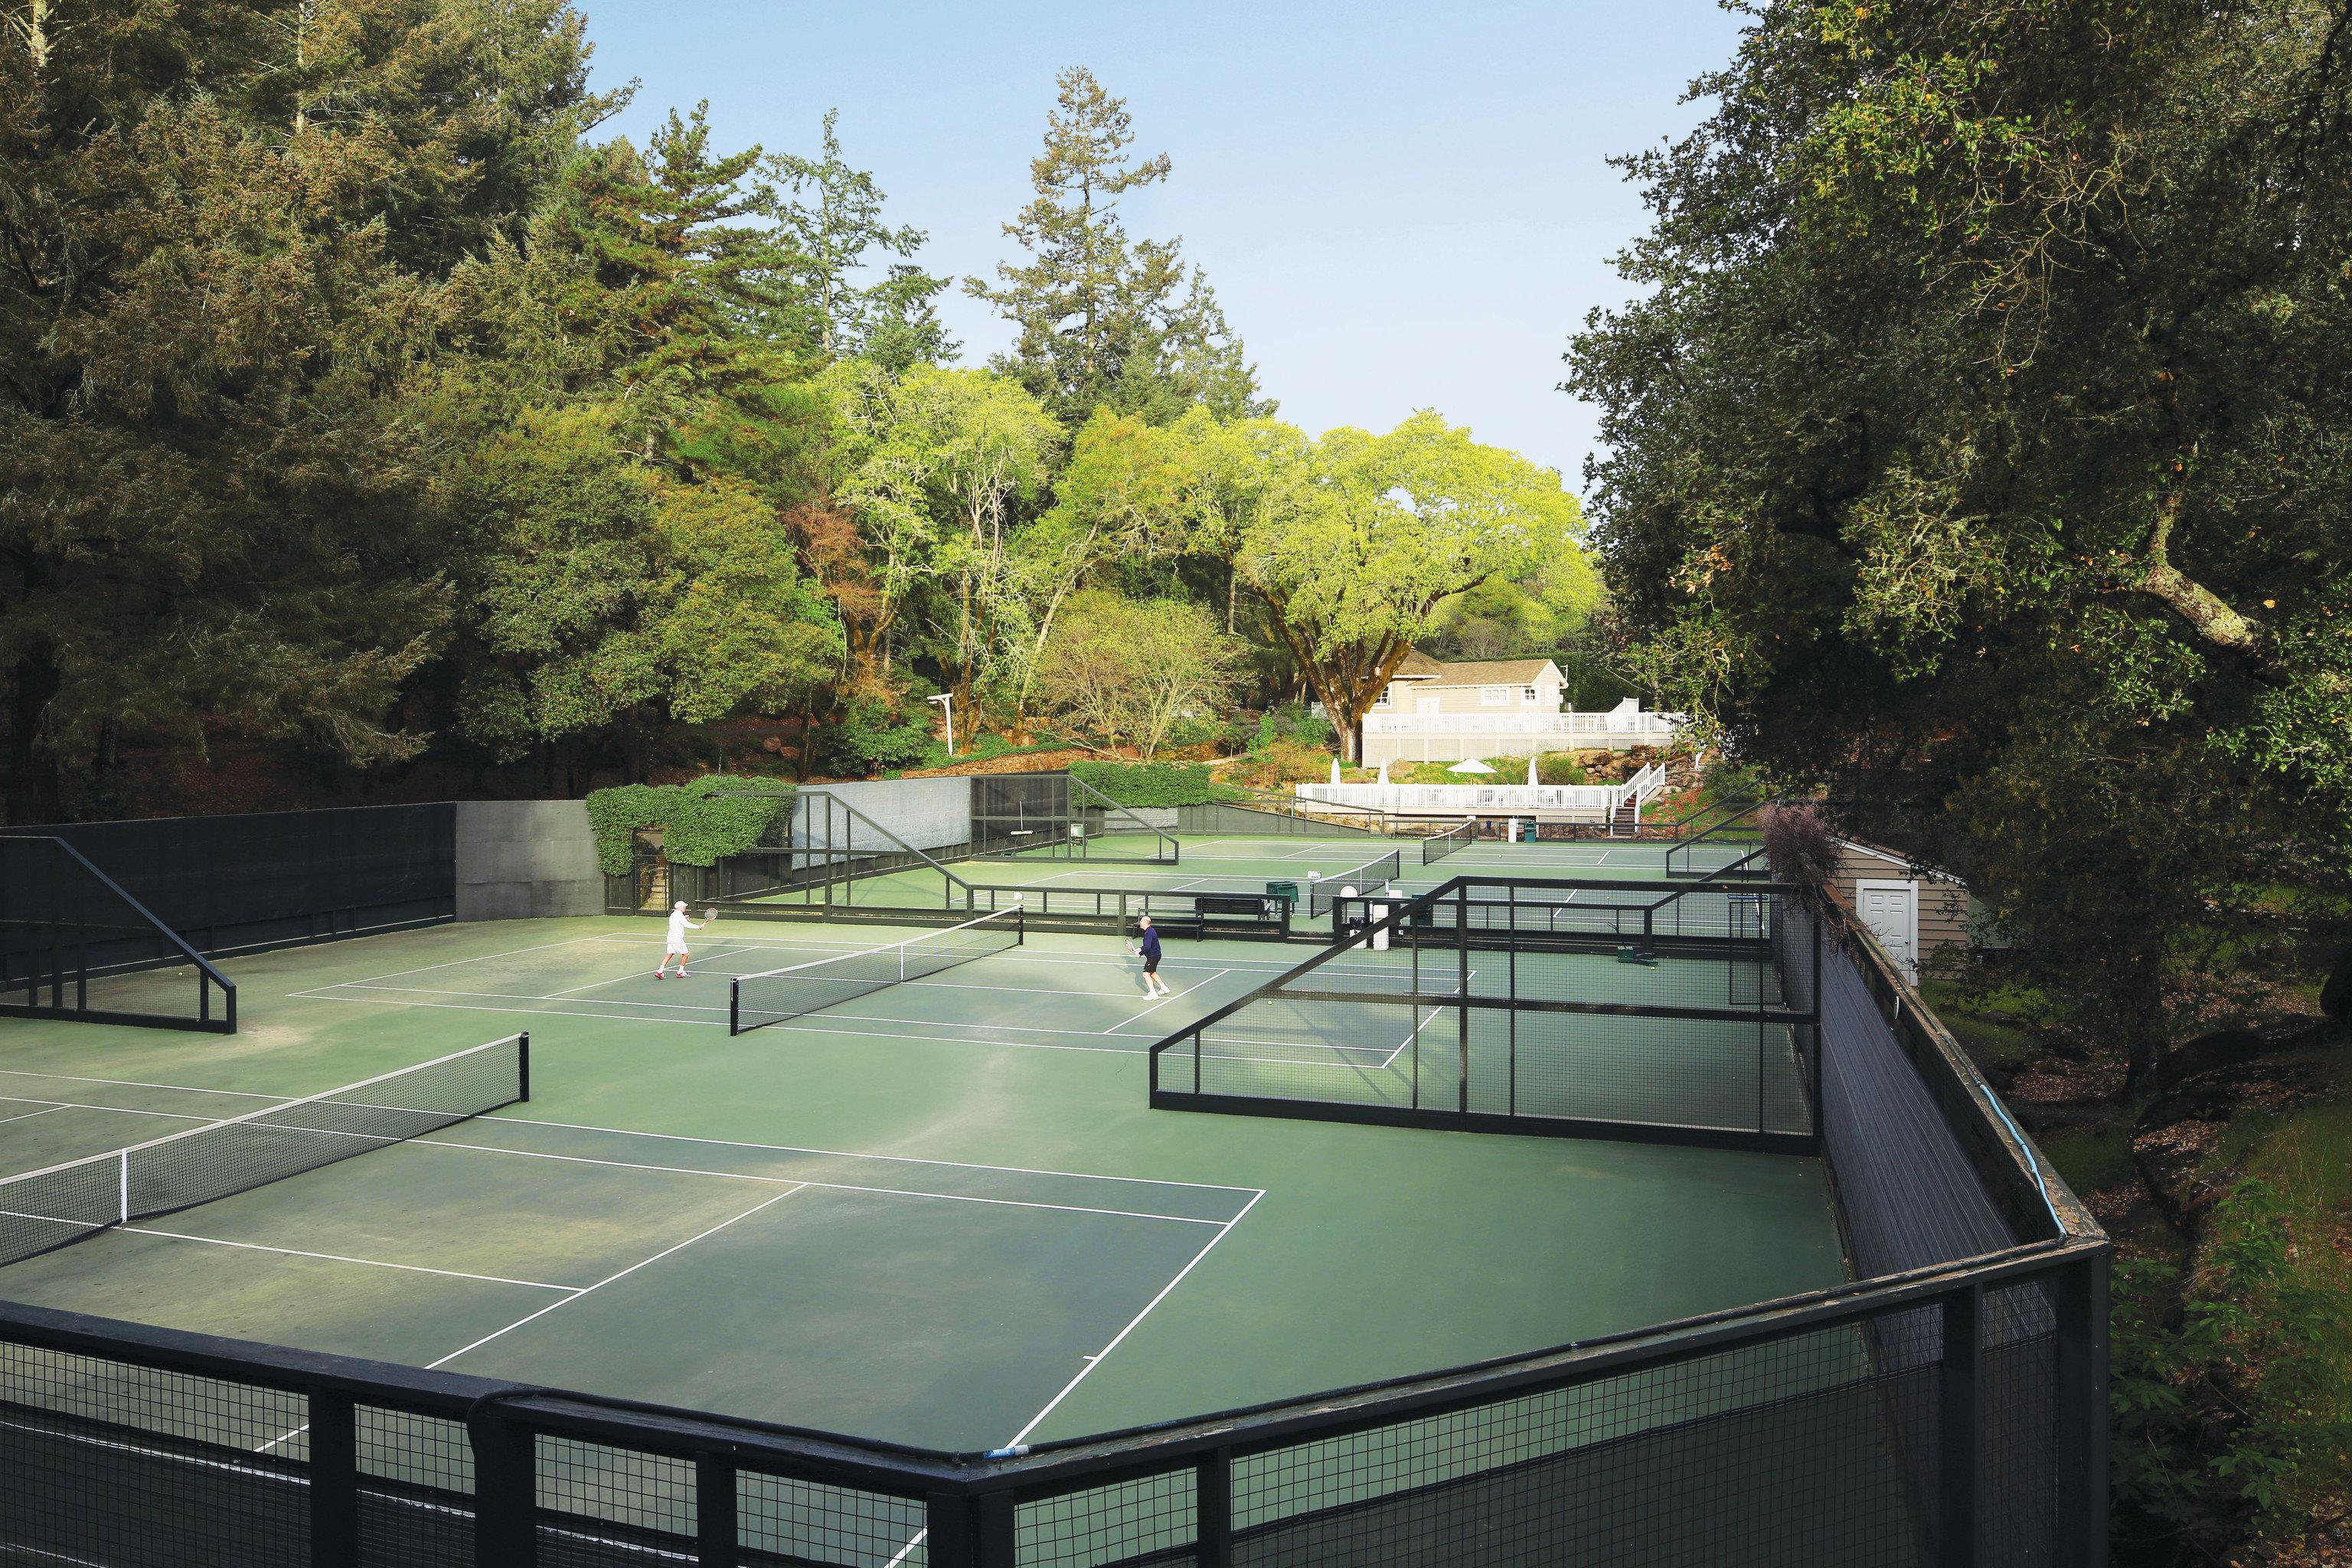 tree structure swimming pool tennis sport venue backyard